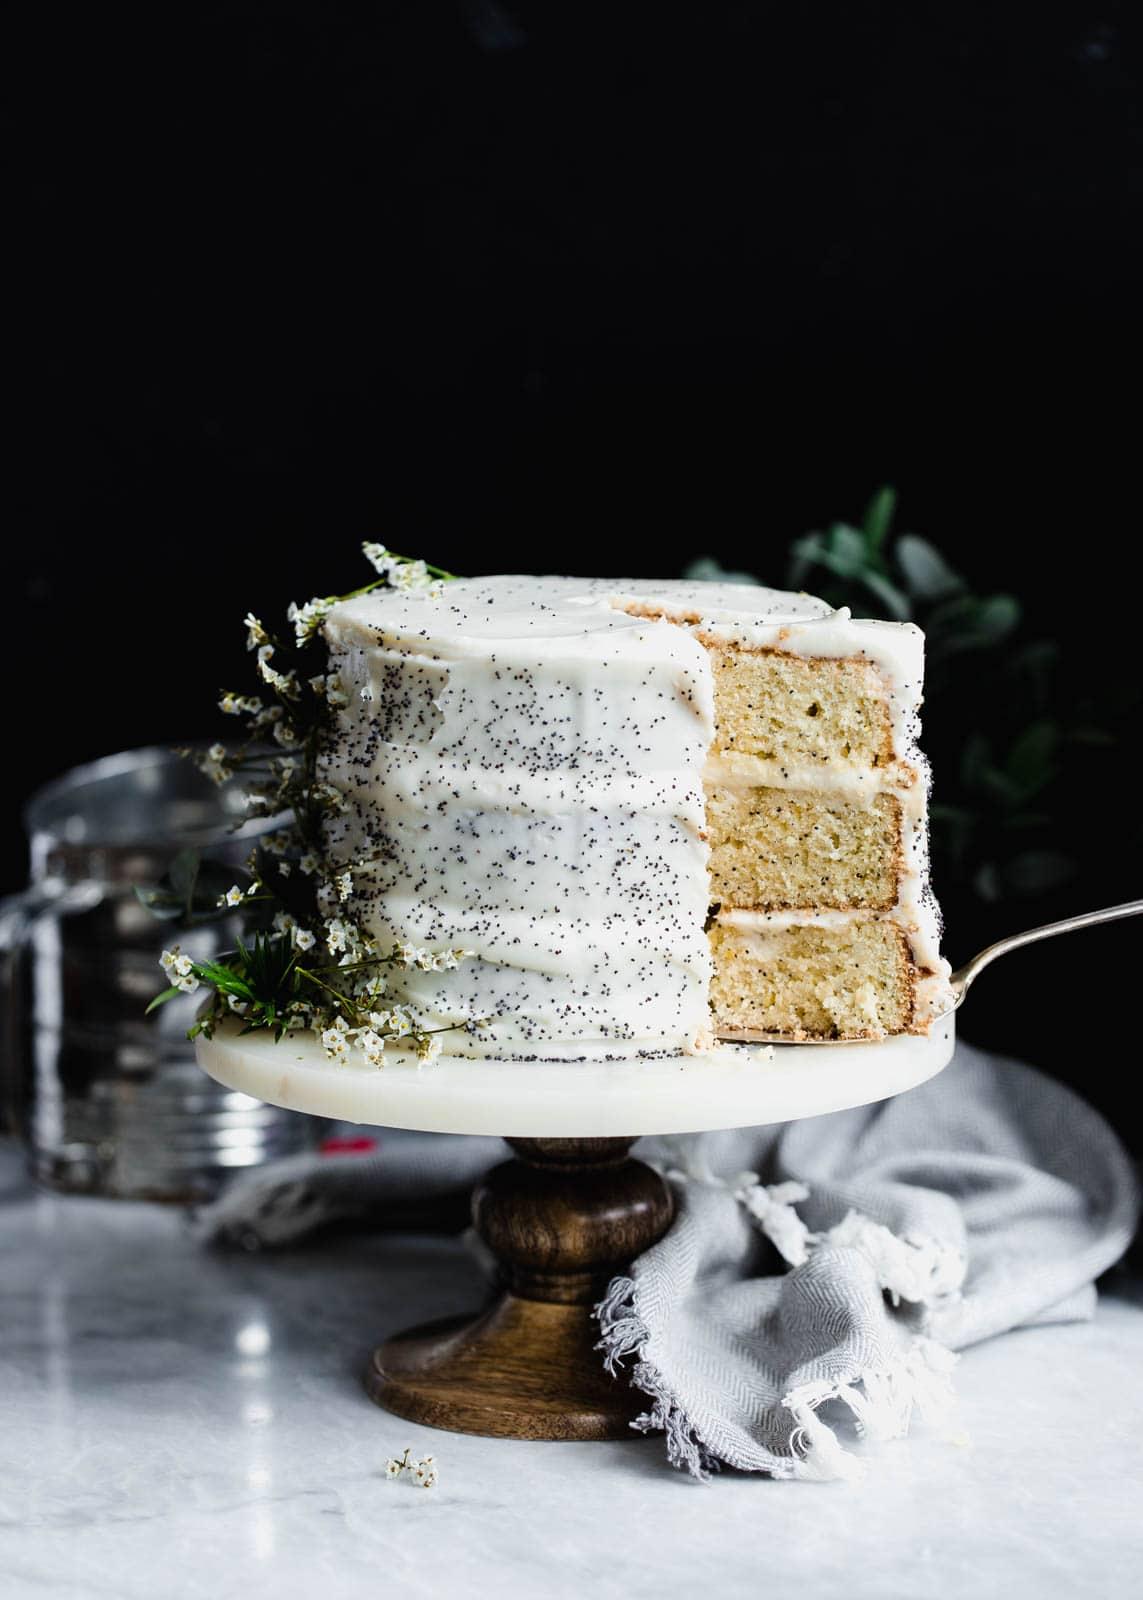 lemon poppy seed cake on cake stand